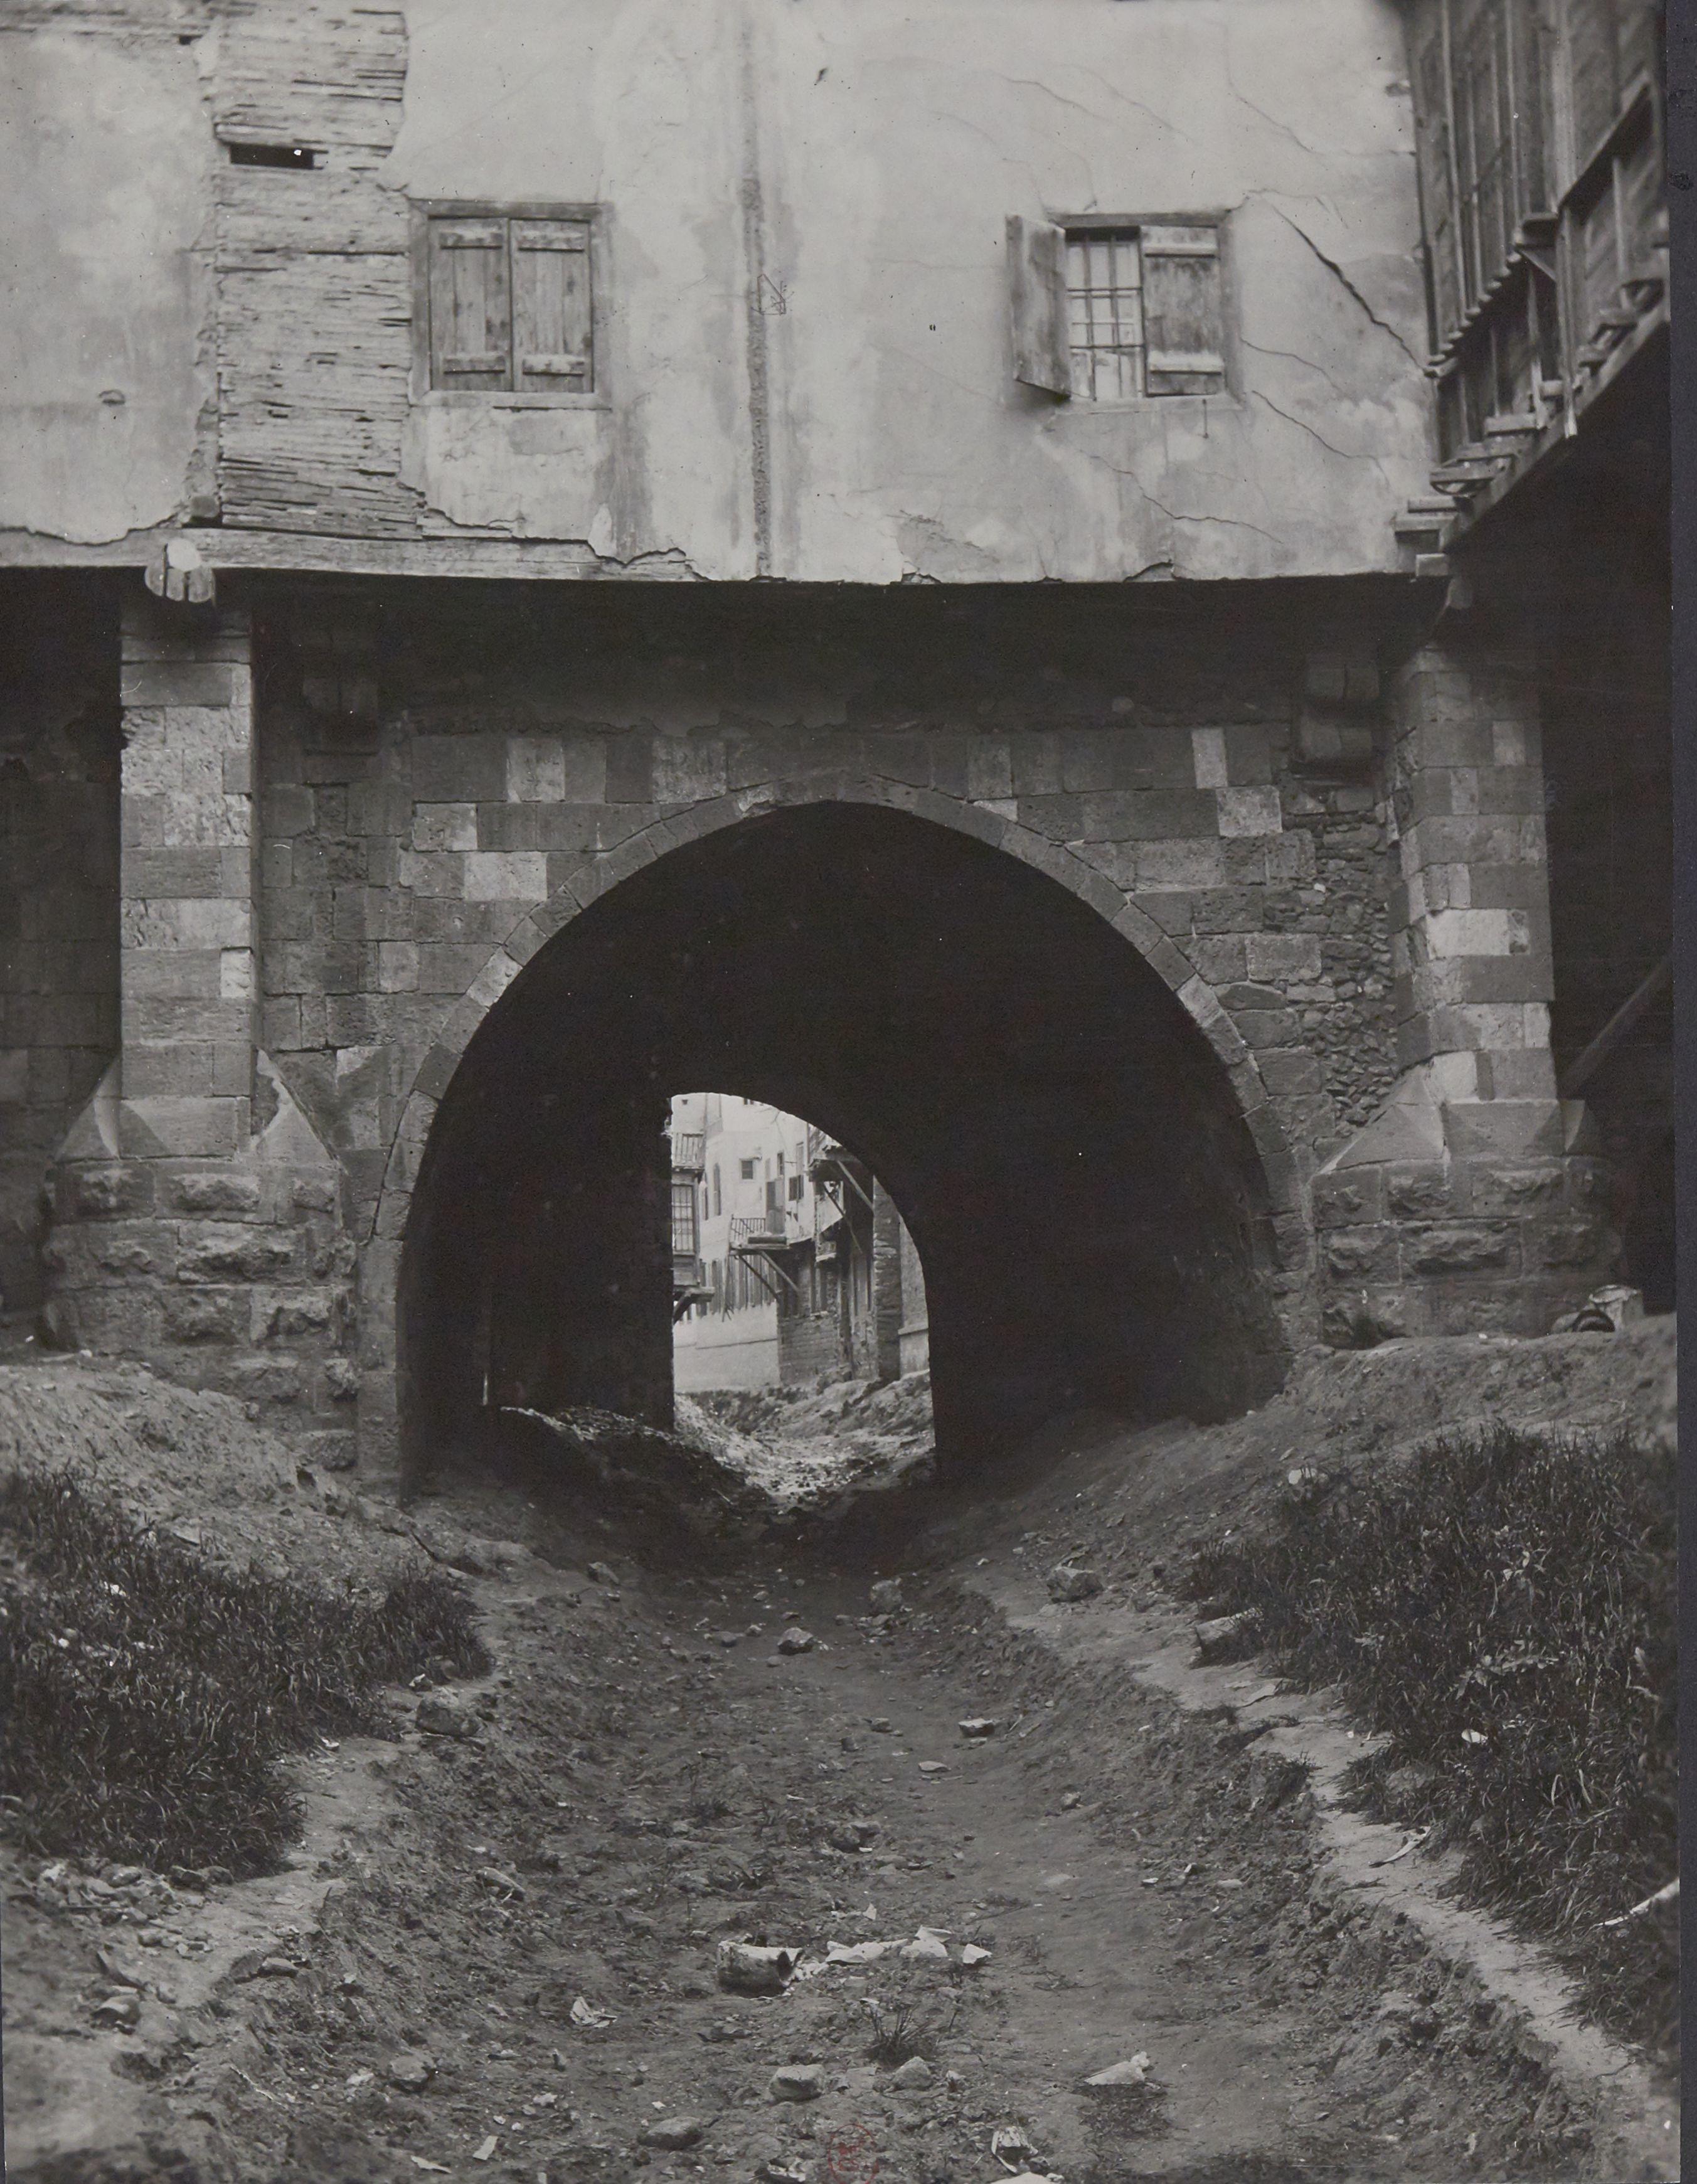 1895. Канал Халиг аль-Масри (1)